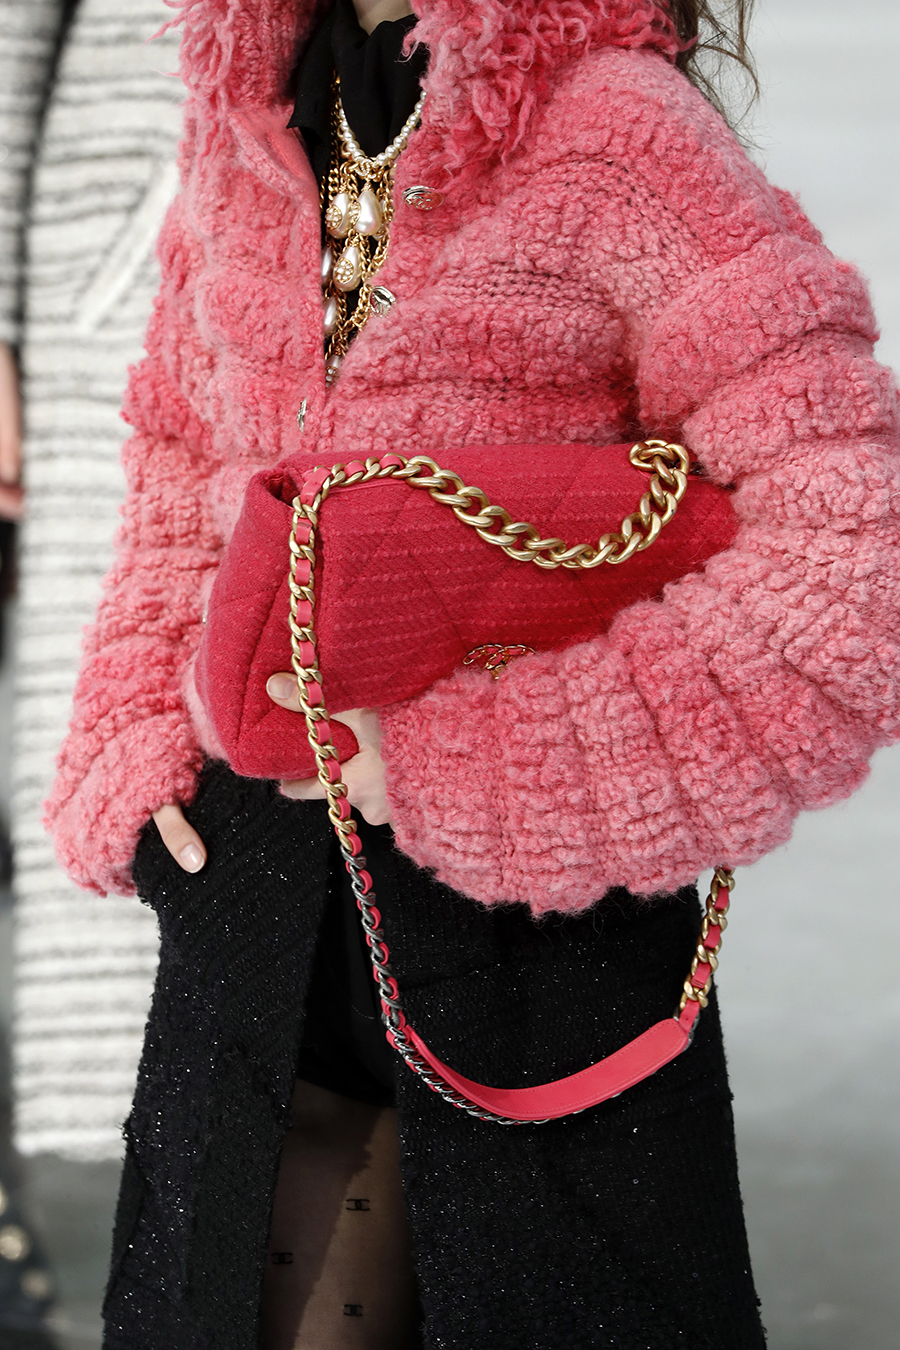 модная стеганая сумка осень зима 2020 2021 розовая фуксия на цепочке